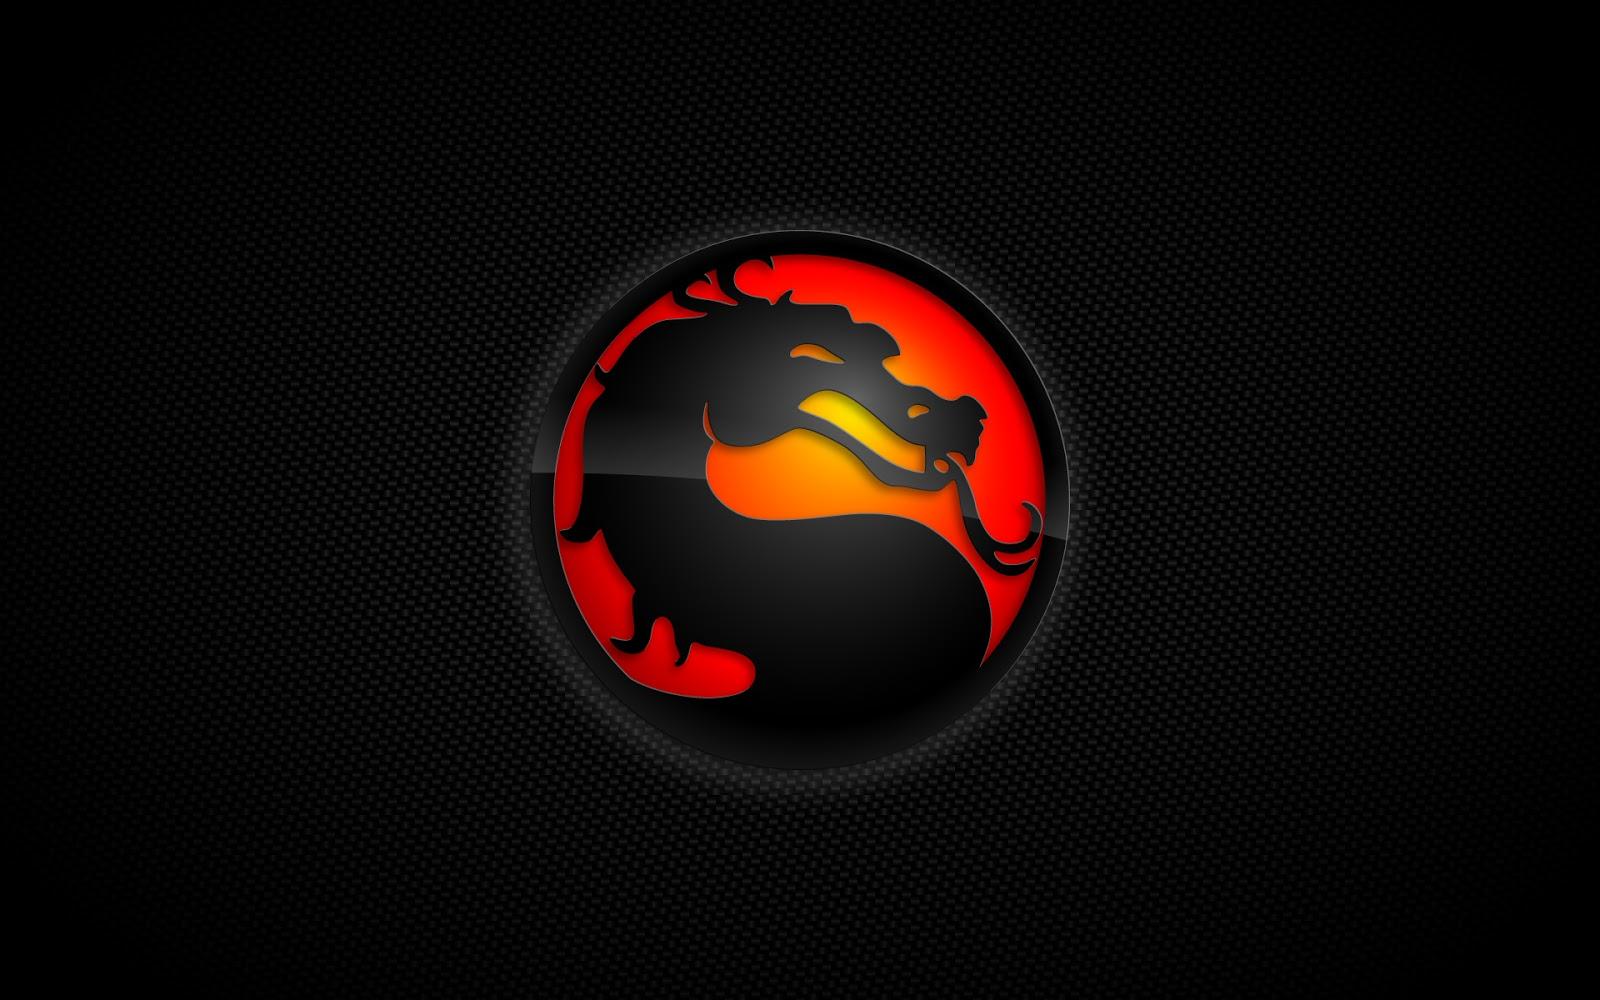 http://1.bp.blogspot.com/-yer-bxN8zhk/US1dD-fBNVI/AAAAAAAACig/BclslDFEVGM/s1600/glossymortalkombat-277961.jpeg